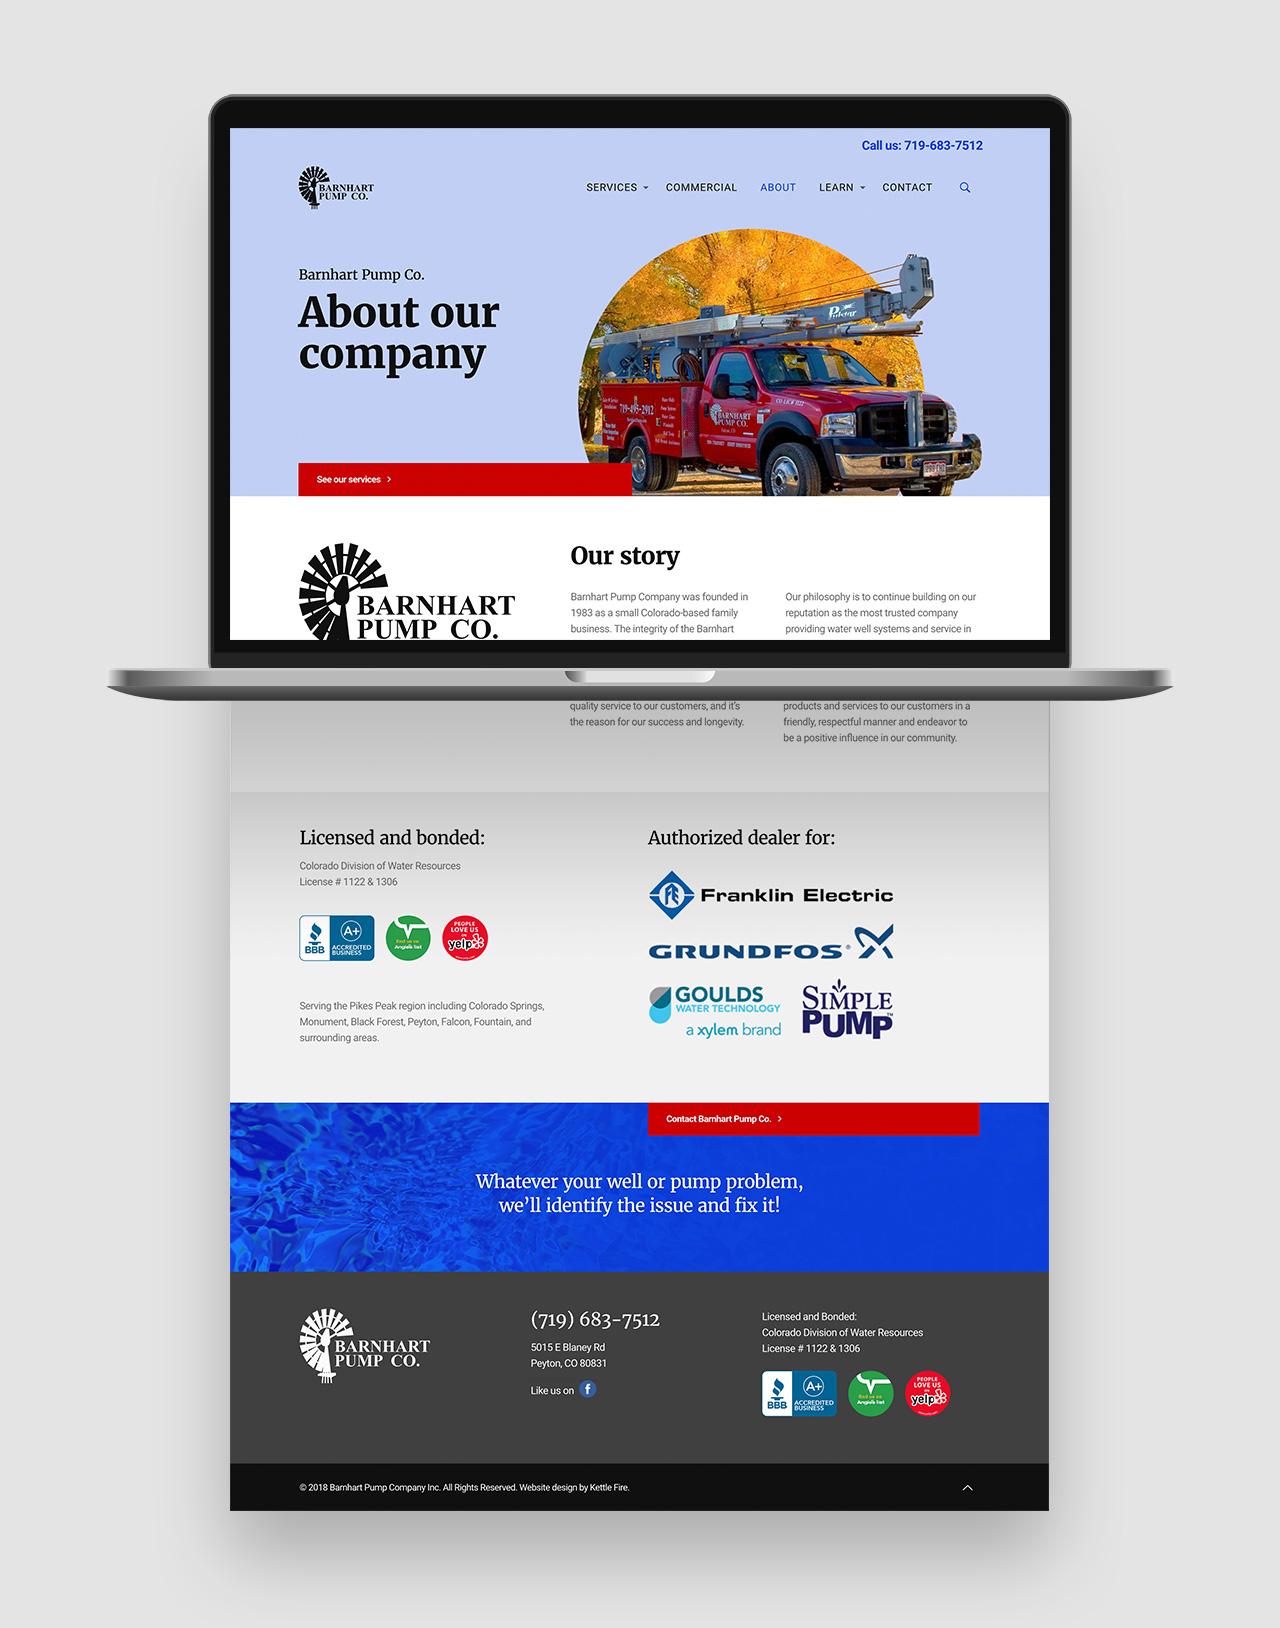 web design user experience Barnhart Pump Co by Kettle Fire Creative web design Web Design + User ExperienceBarnhart Pump Co. bp website about mockup